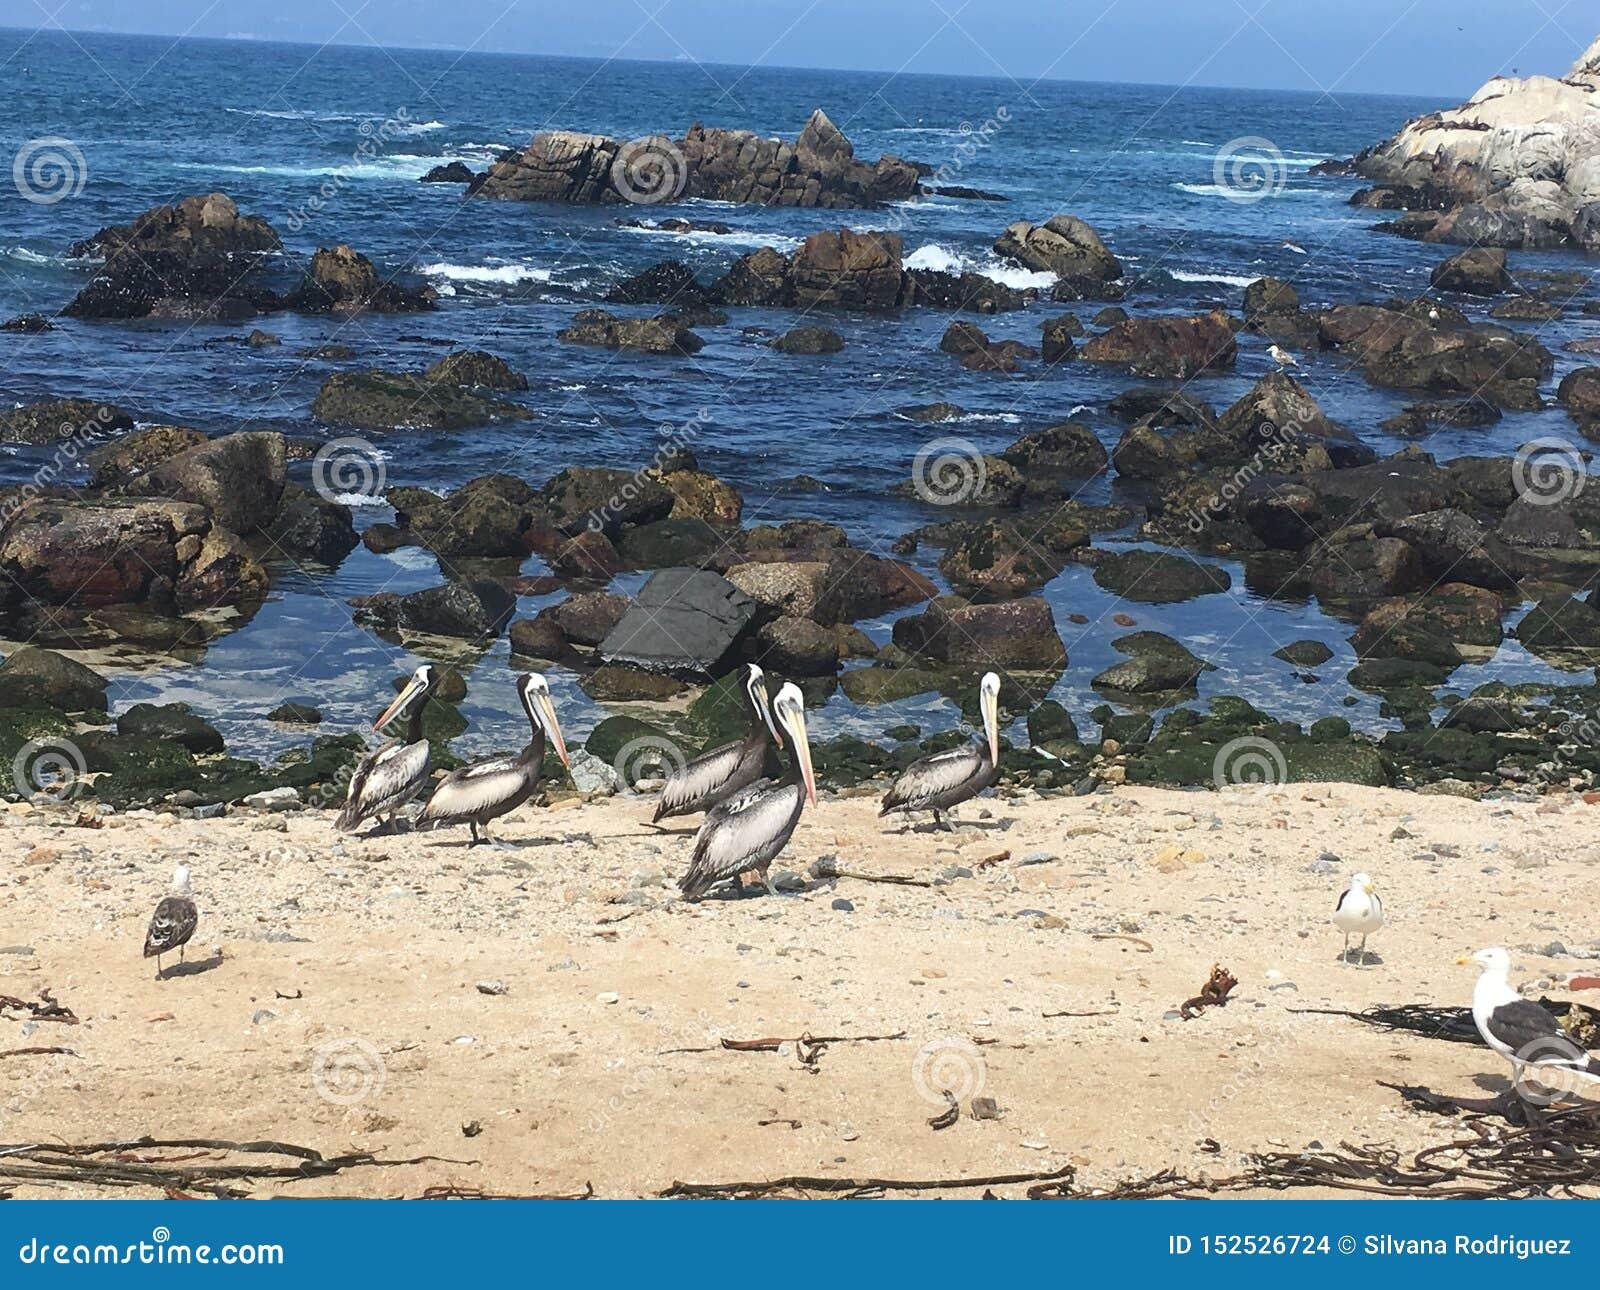 Pellicano valparaiso